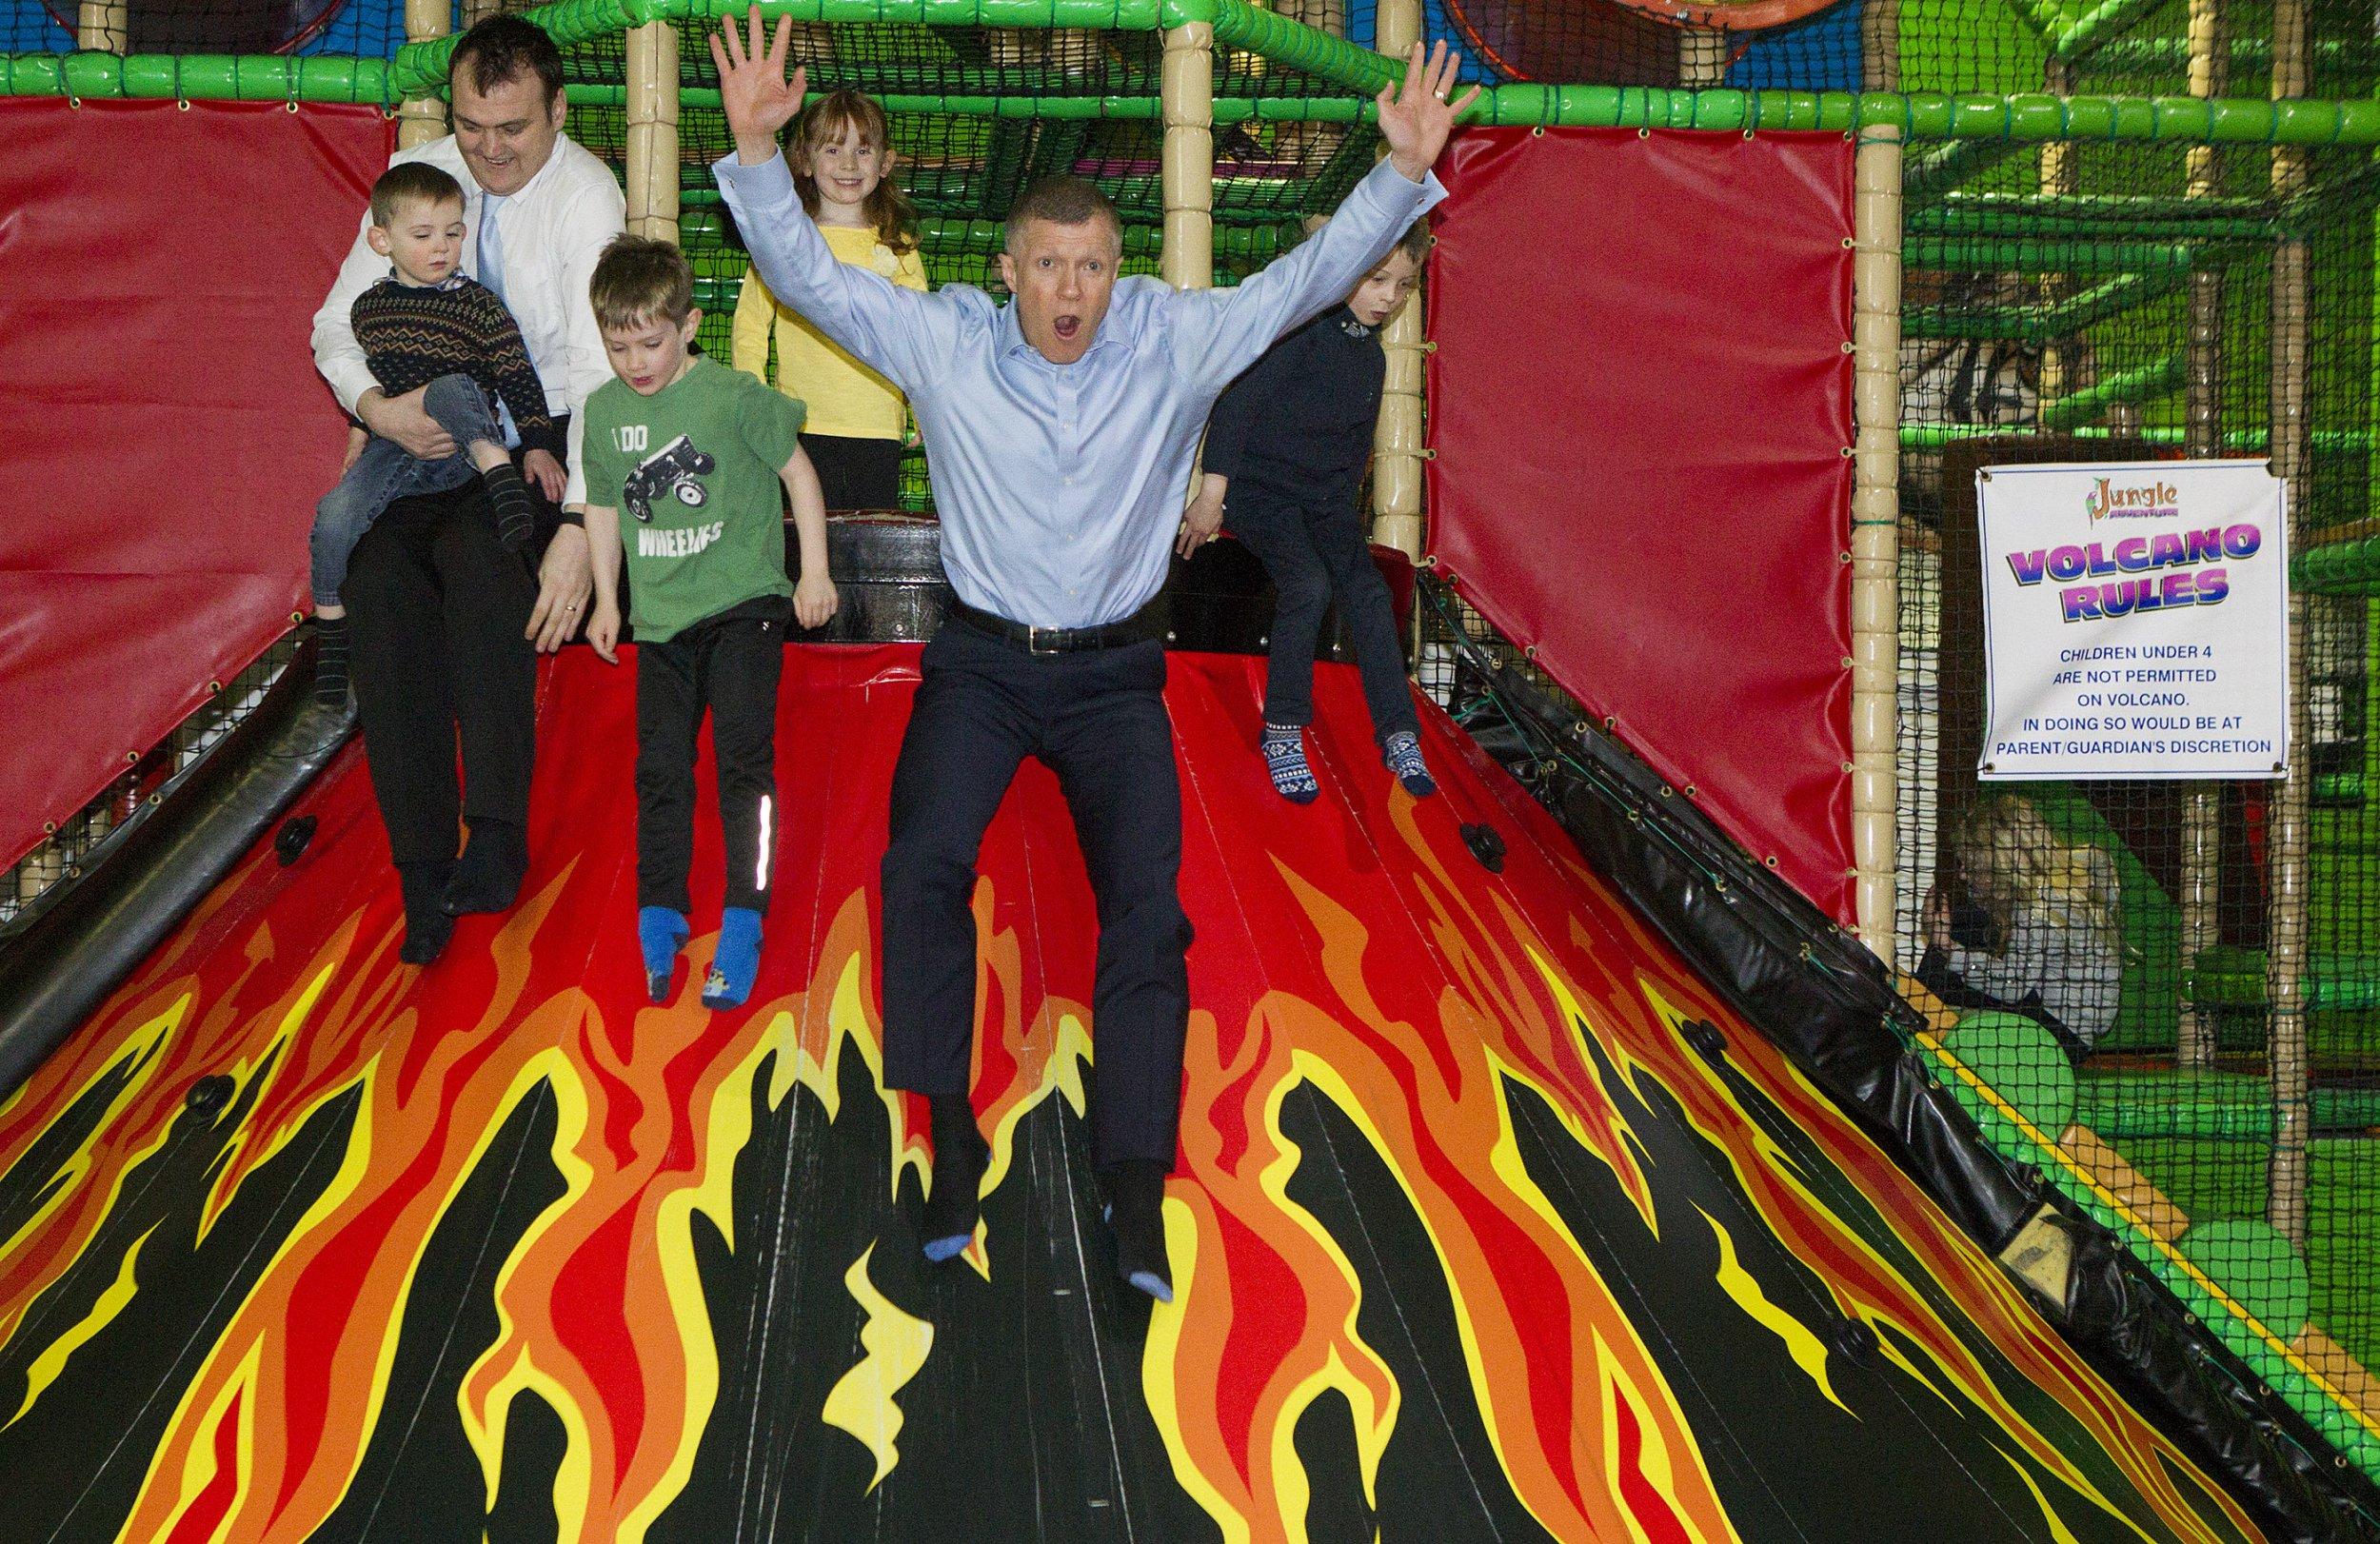 Scottish Lib Dems are really enjoying this massive inflatable volcano